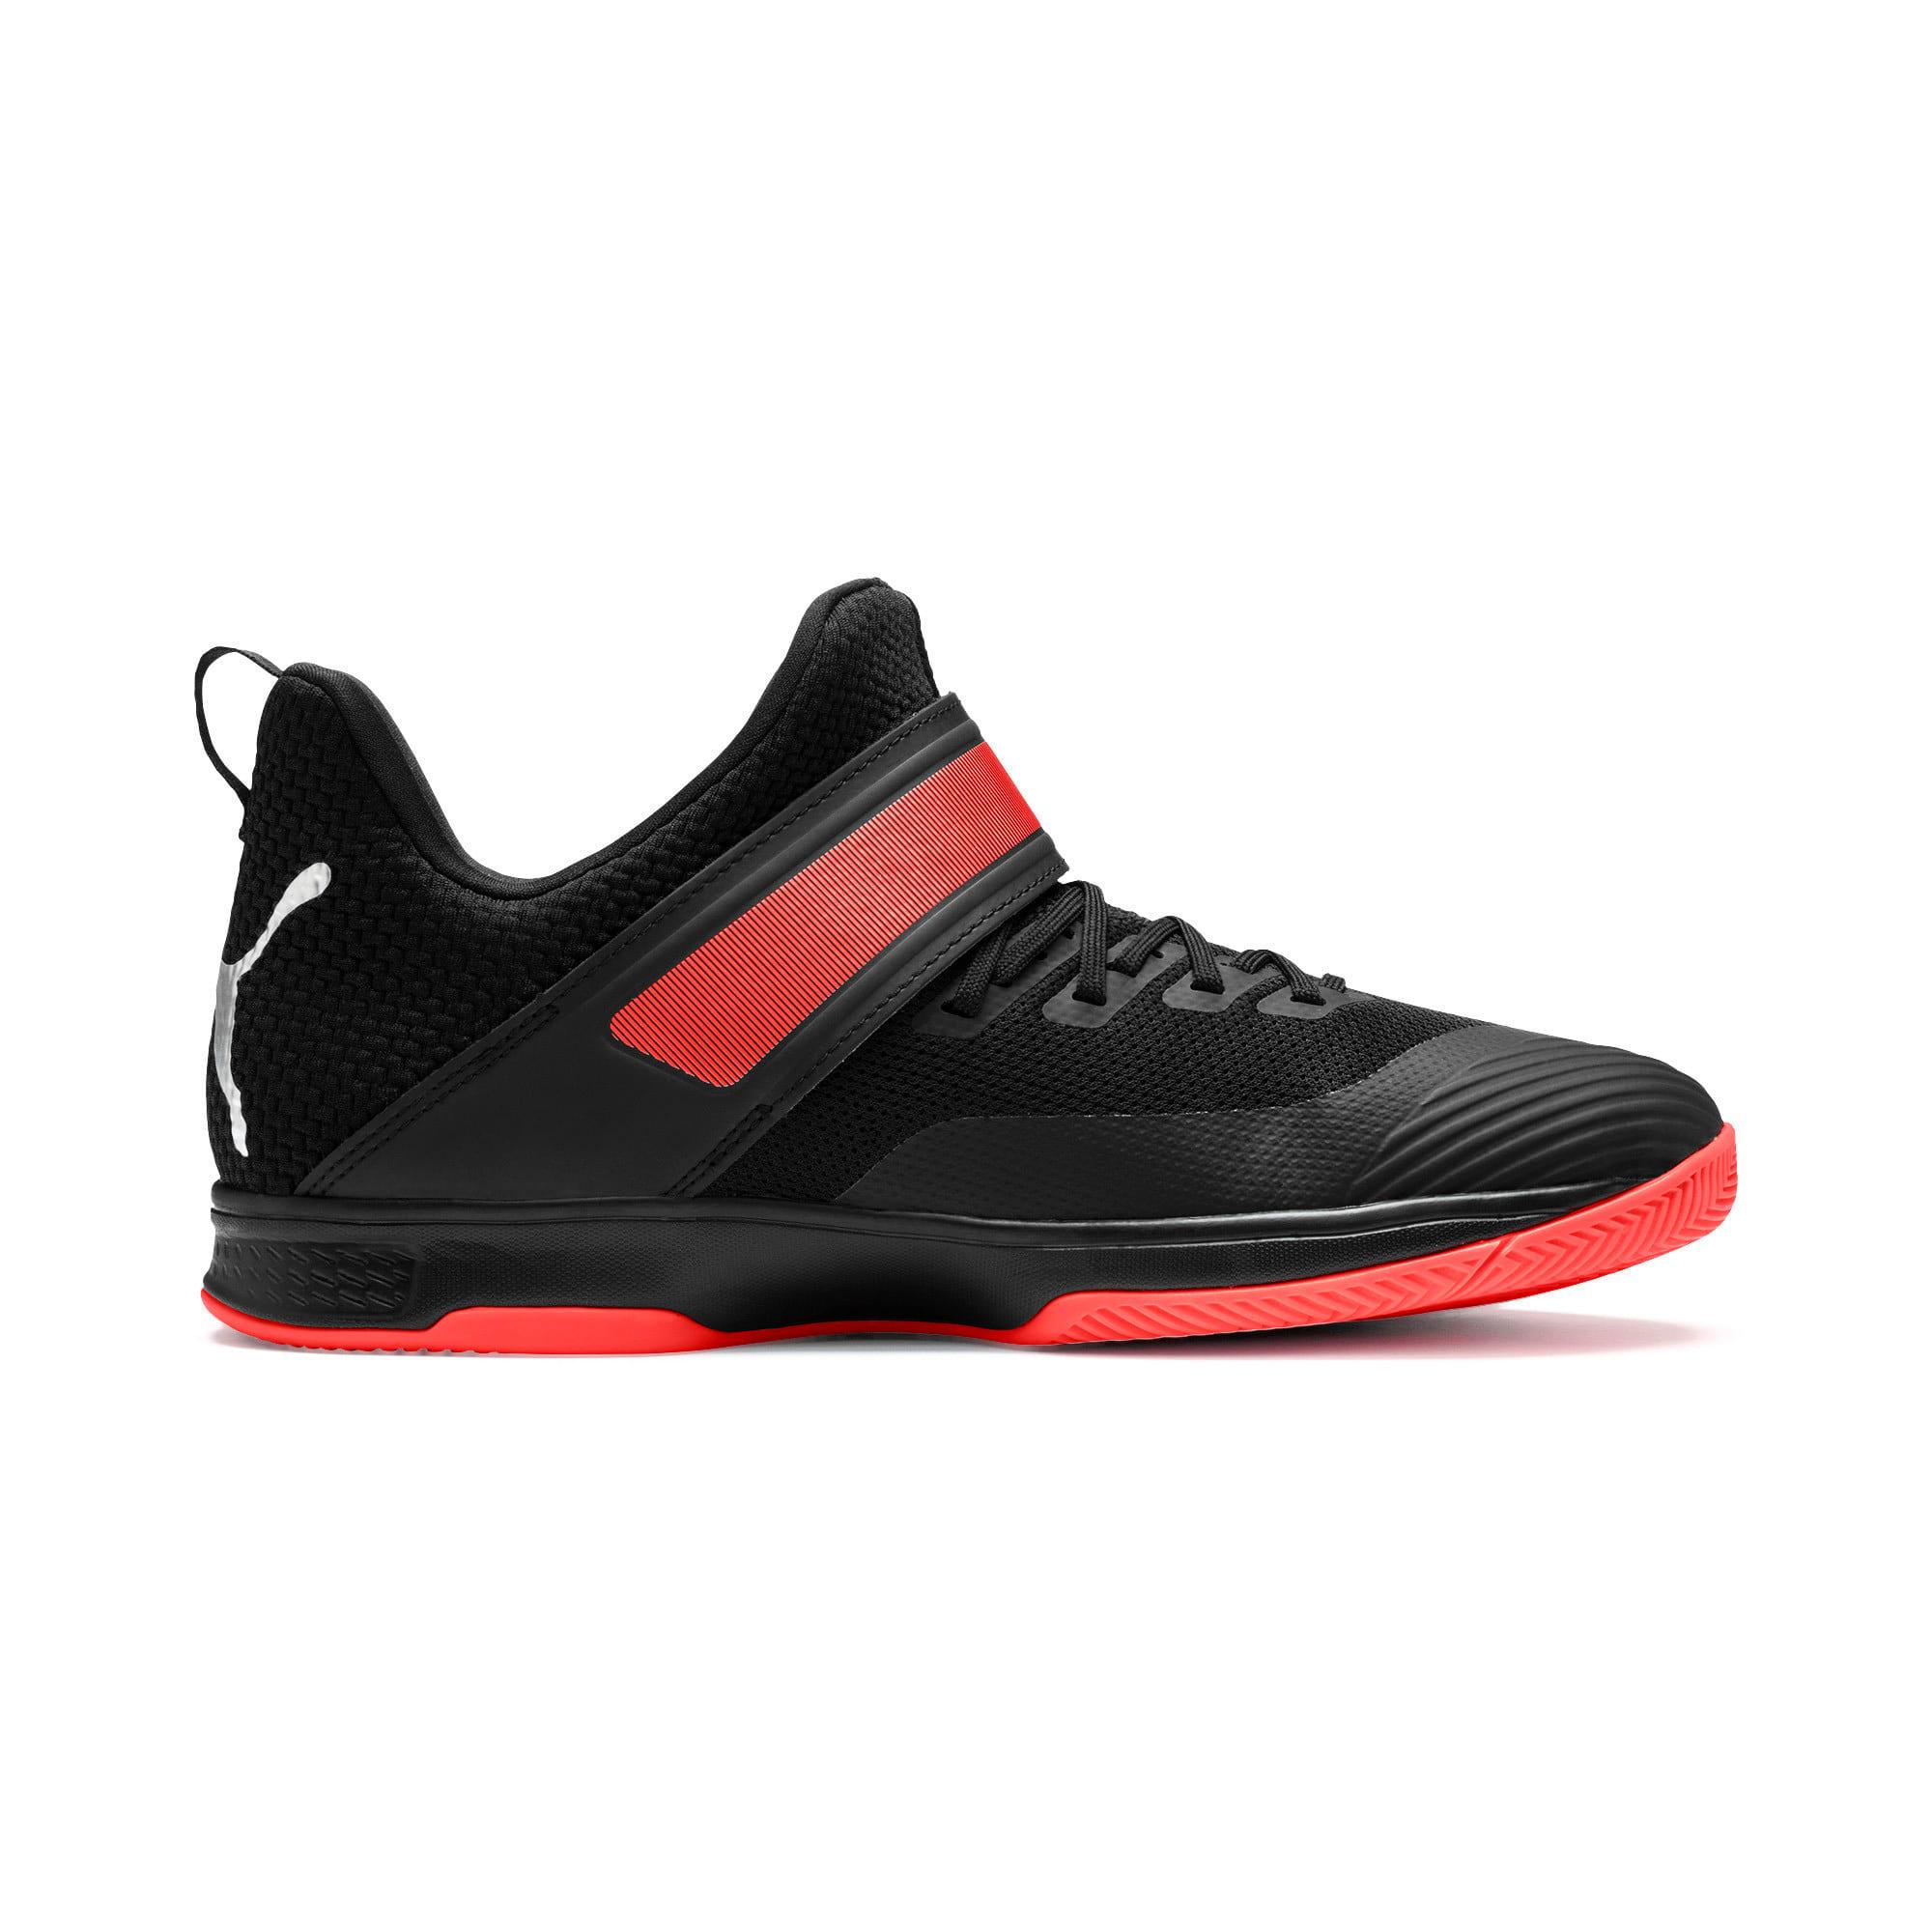 Thumbnail 6 of Rise XT3 Handball Shoes, Puma Black-Silver-Nrgy Red, medium